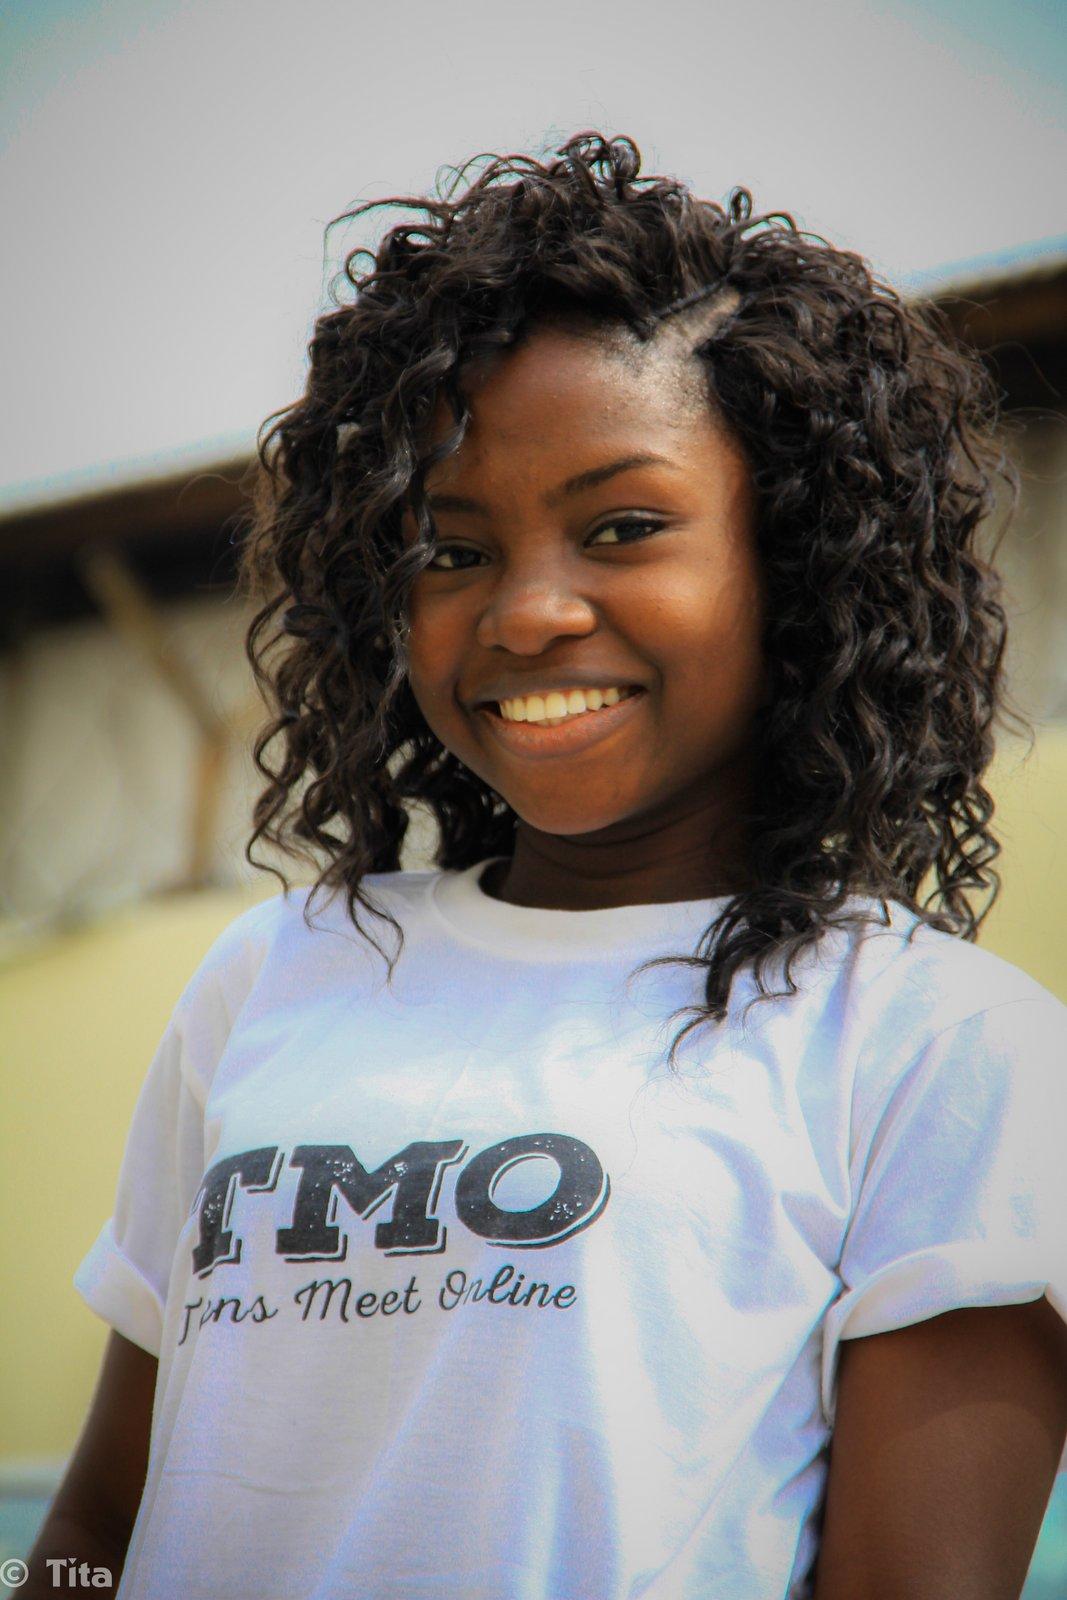 TMO Shirt